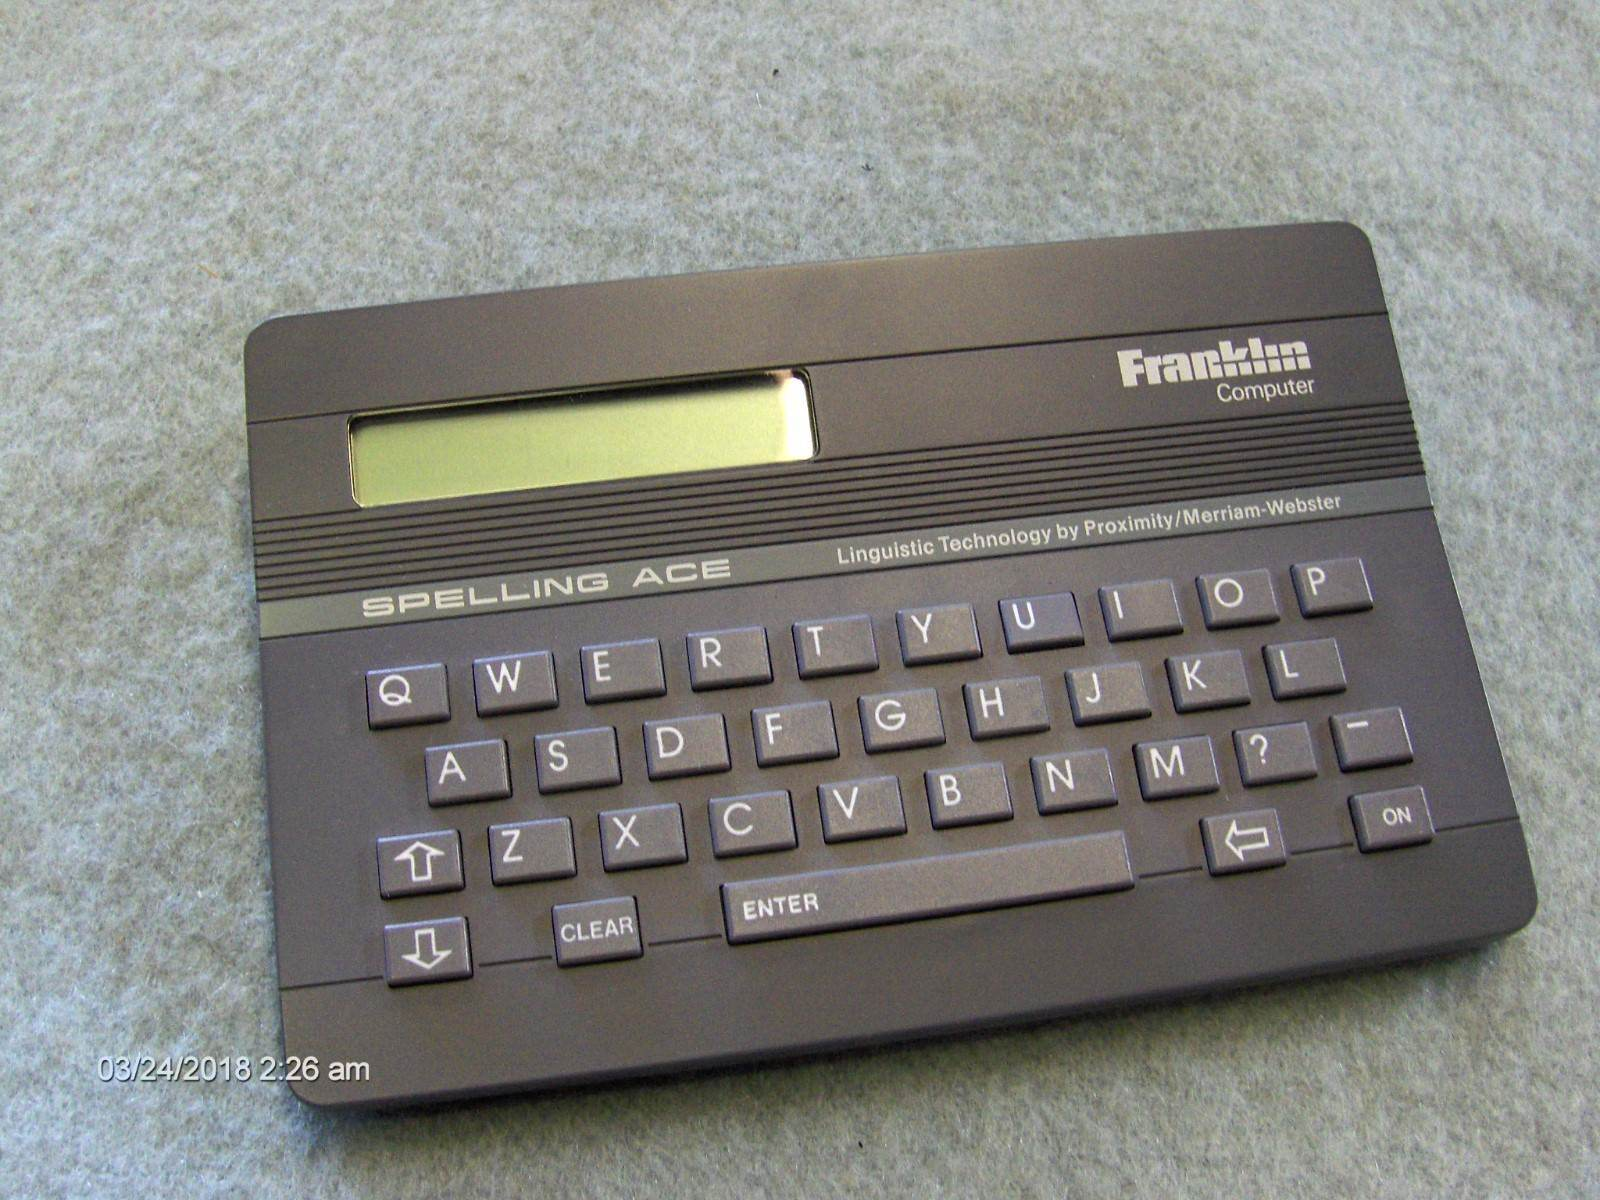 1987 Vintage Hand Held Franklin Computer Spelling Ace SA-98 Works great